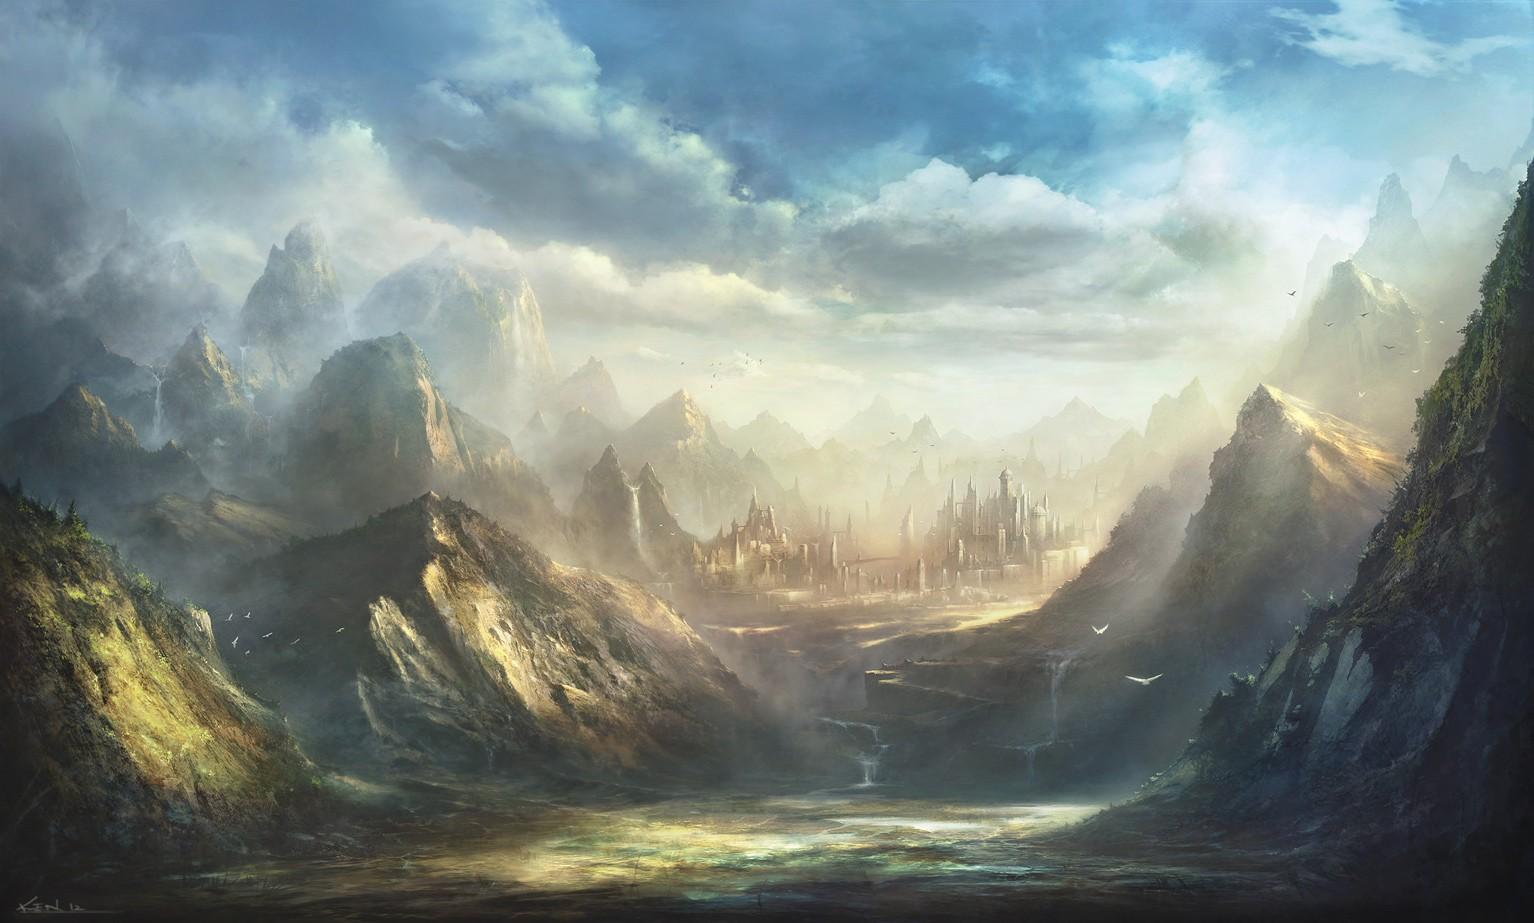 Wallpaper : sunlight, mountains, fantasy art, sky, fantasy city, sunrise,  morning, castle, mist, valley, plateau, cloud, fog, dawn, atmospheric  phenomenon, computer wallpaper, mountainous landforms, mountain range  1534x923 - Cryzeen - 34110 - HD ...